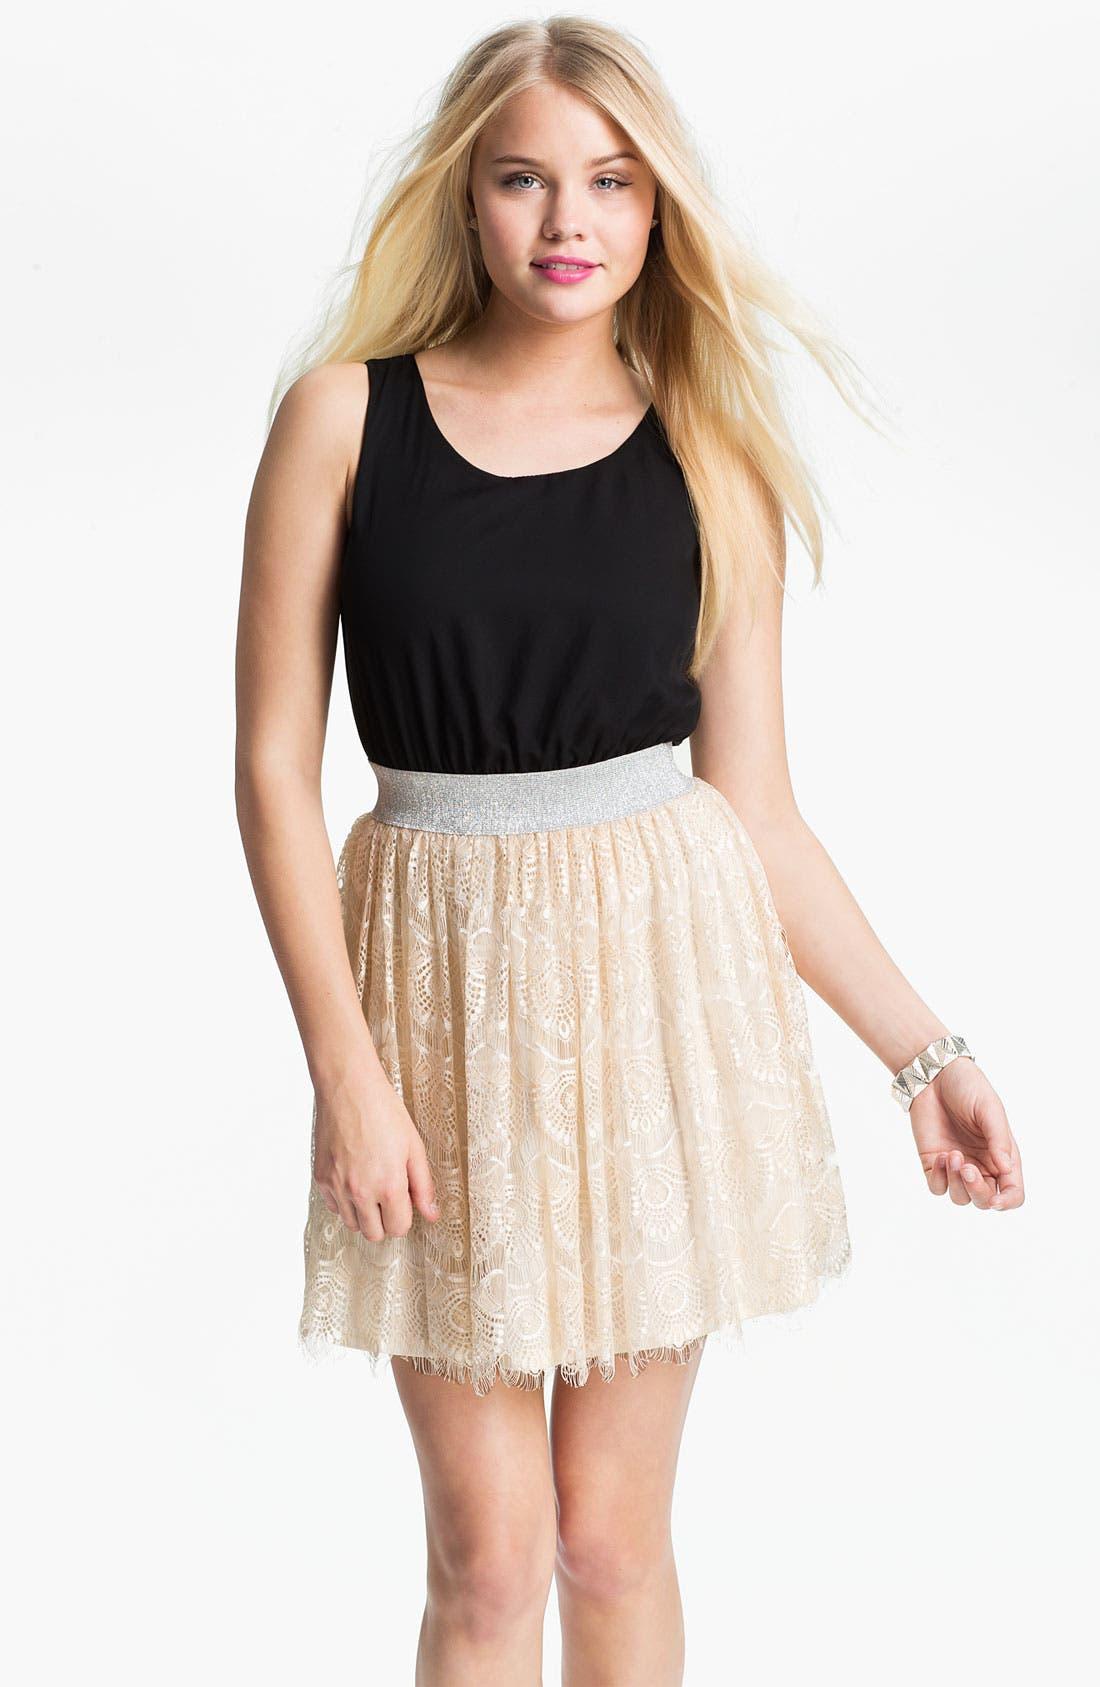 Alternate Image 1 Selected - As U Wish Lace Skirt Tank Dress (Juniors)